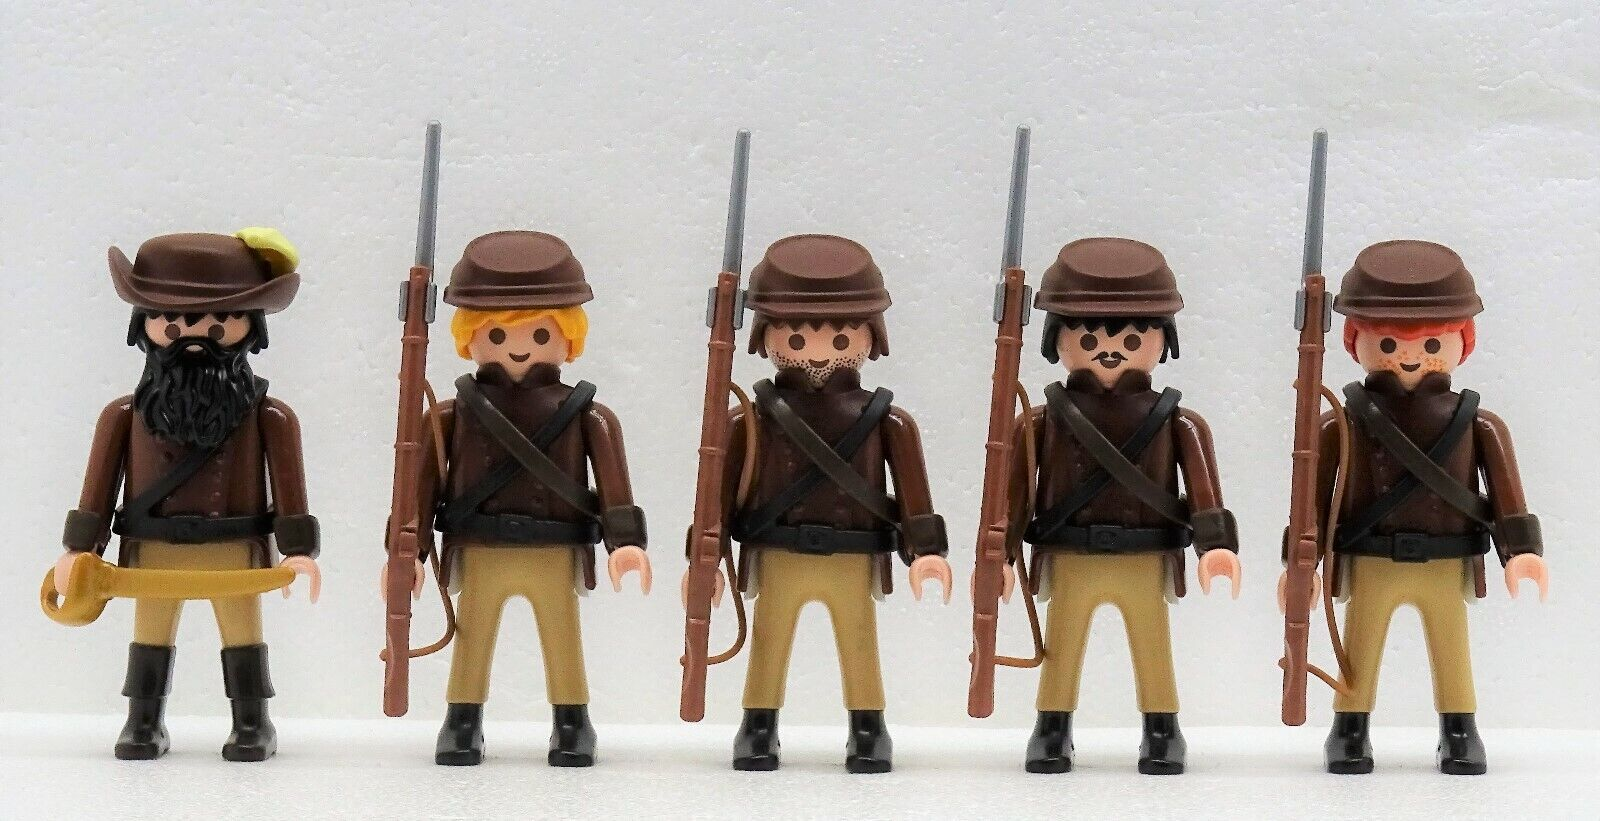 5 Sudistes Bcourir  Soldats + Officier Playmobil Confederates Vs.Citoyen Du Nord  loisir